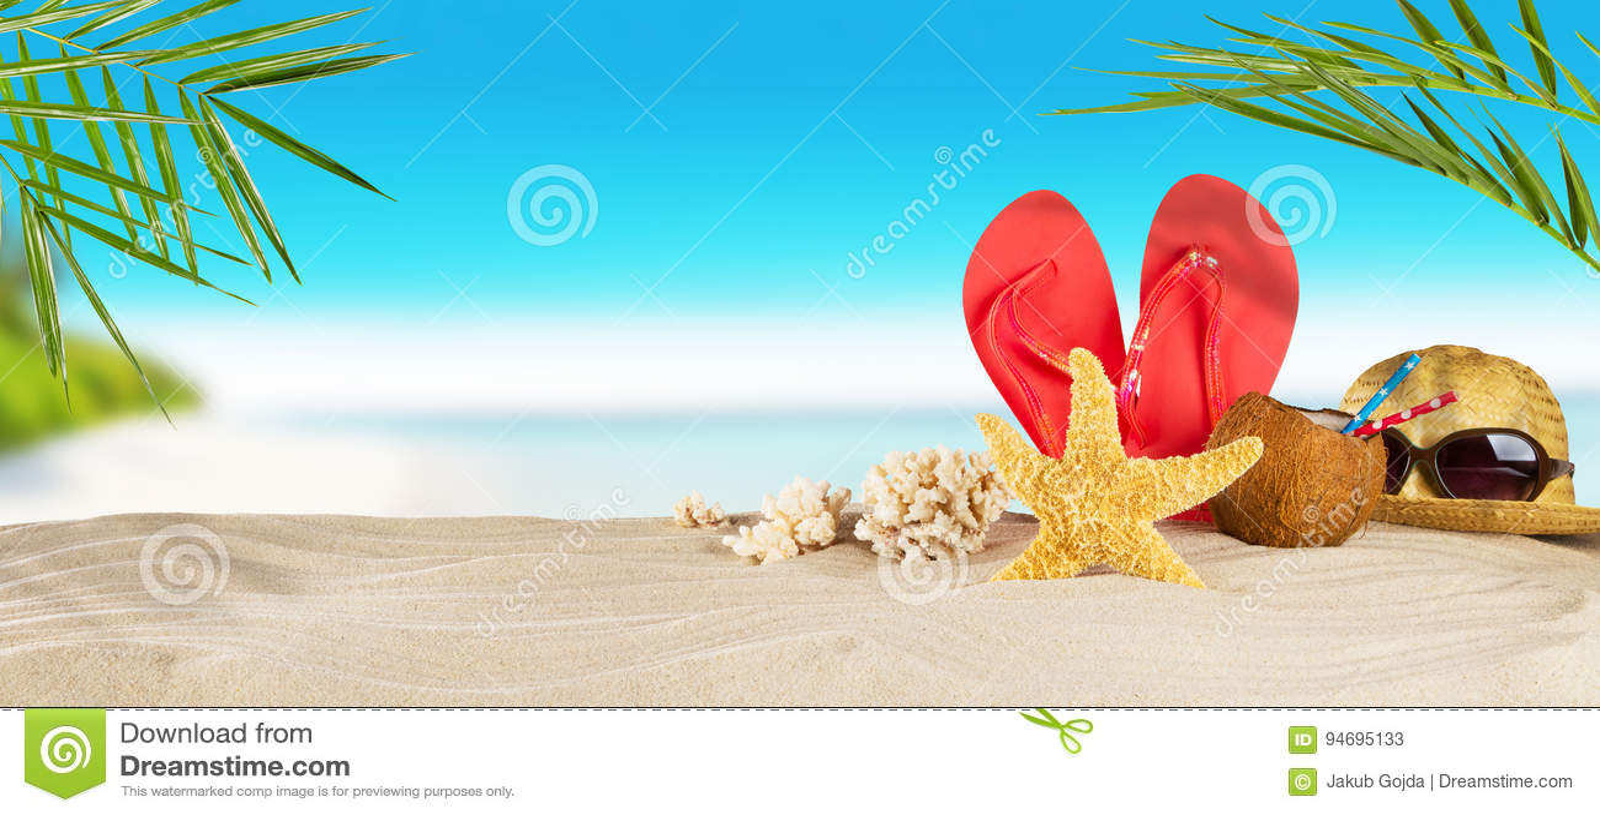 e1c5ff9bbc264 Tropical beach with sunbathing accessories